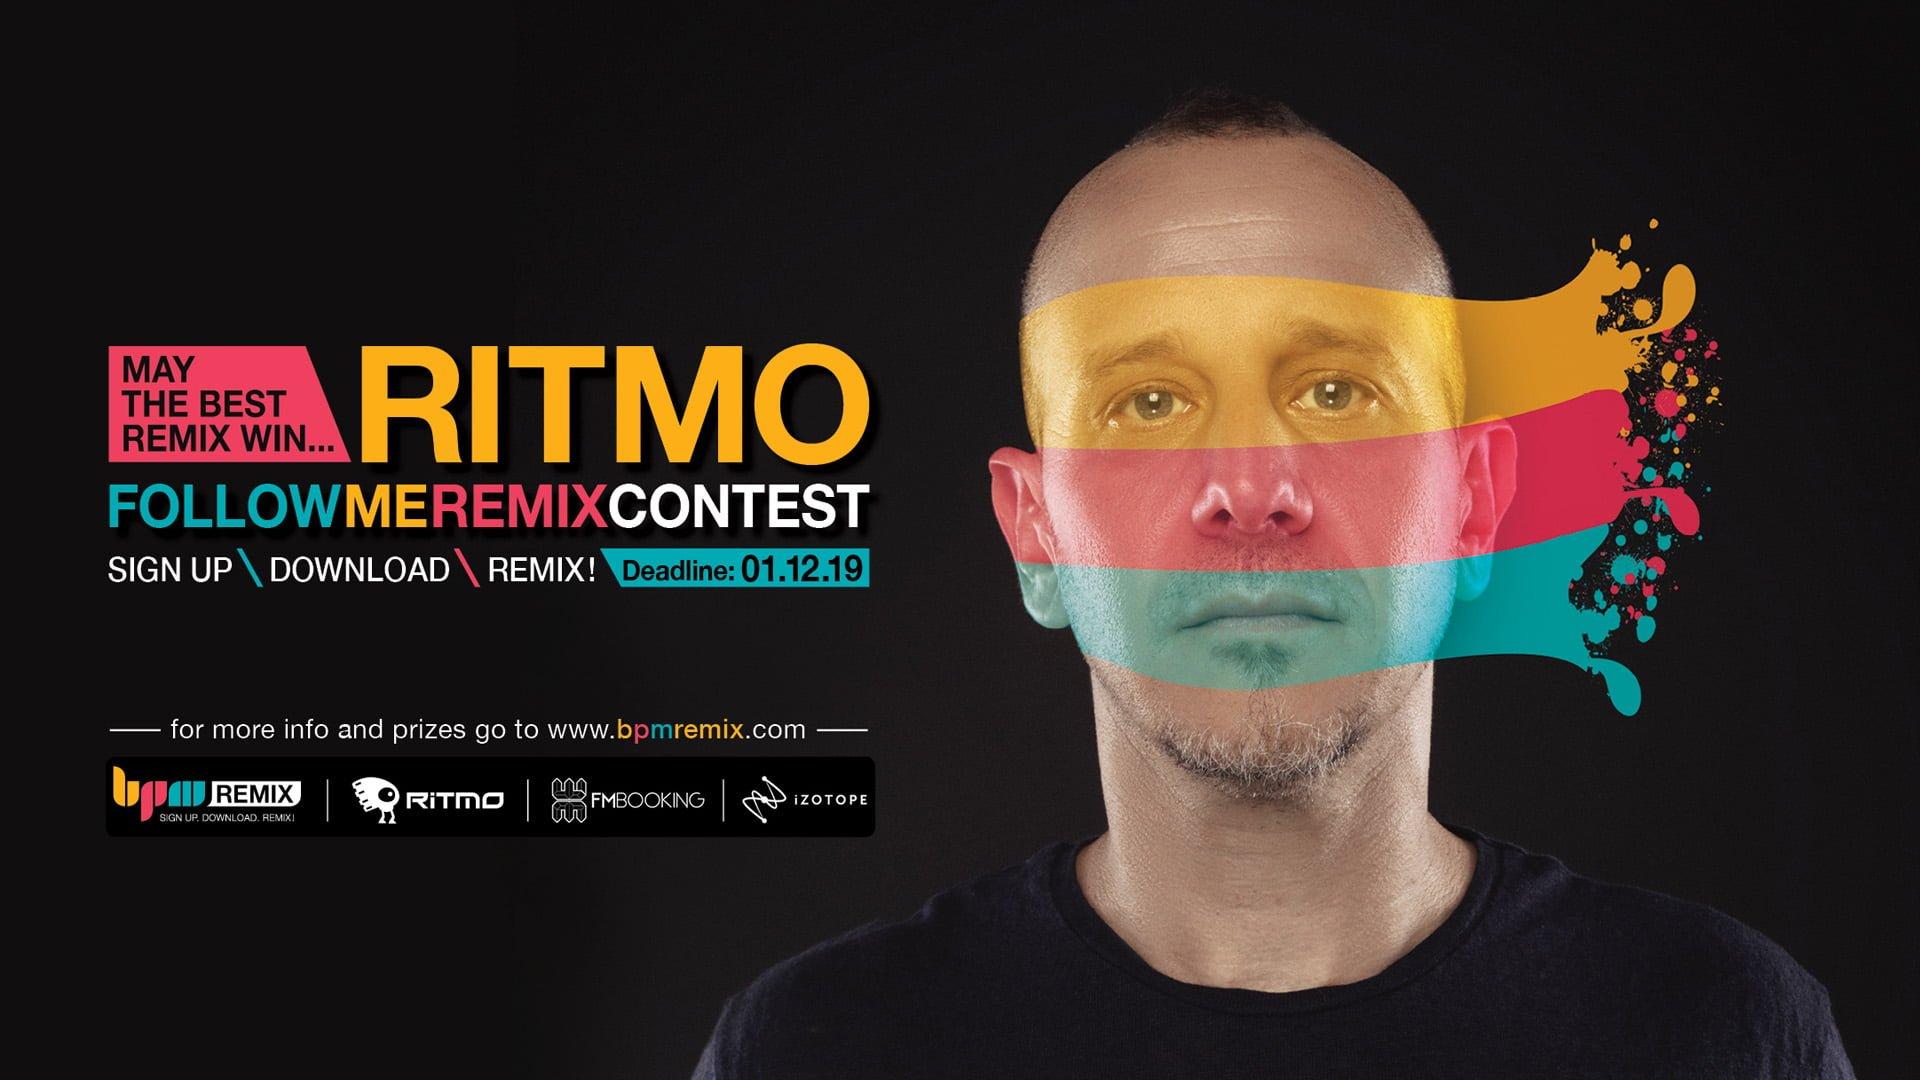 BPMREMIX מציגים: תחרות רמיקסים בינלאומית ל-Ritmo!